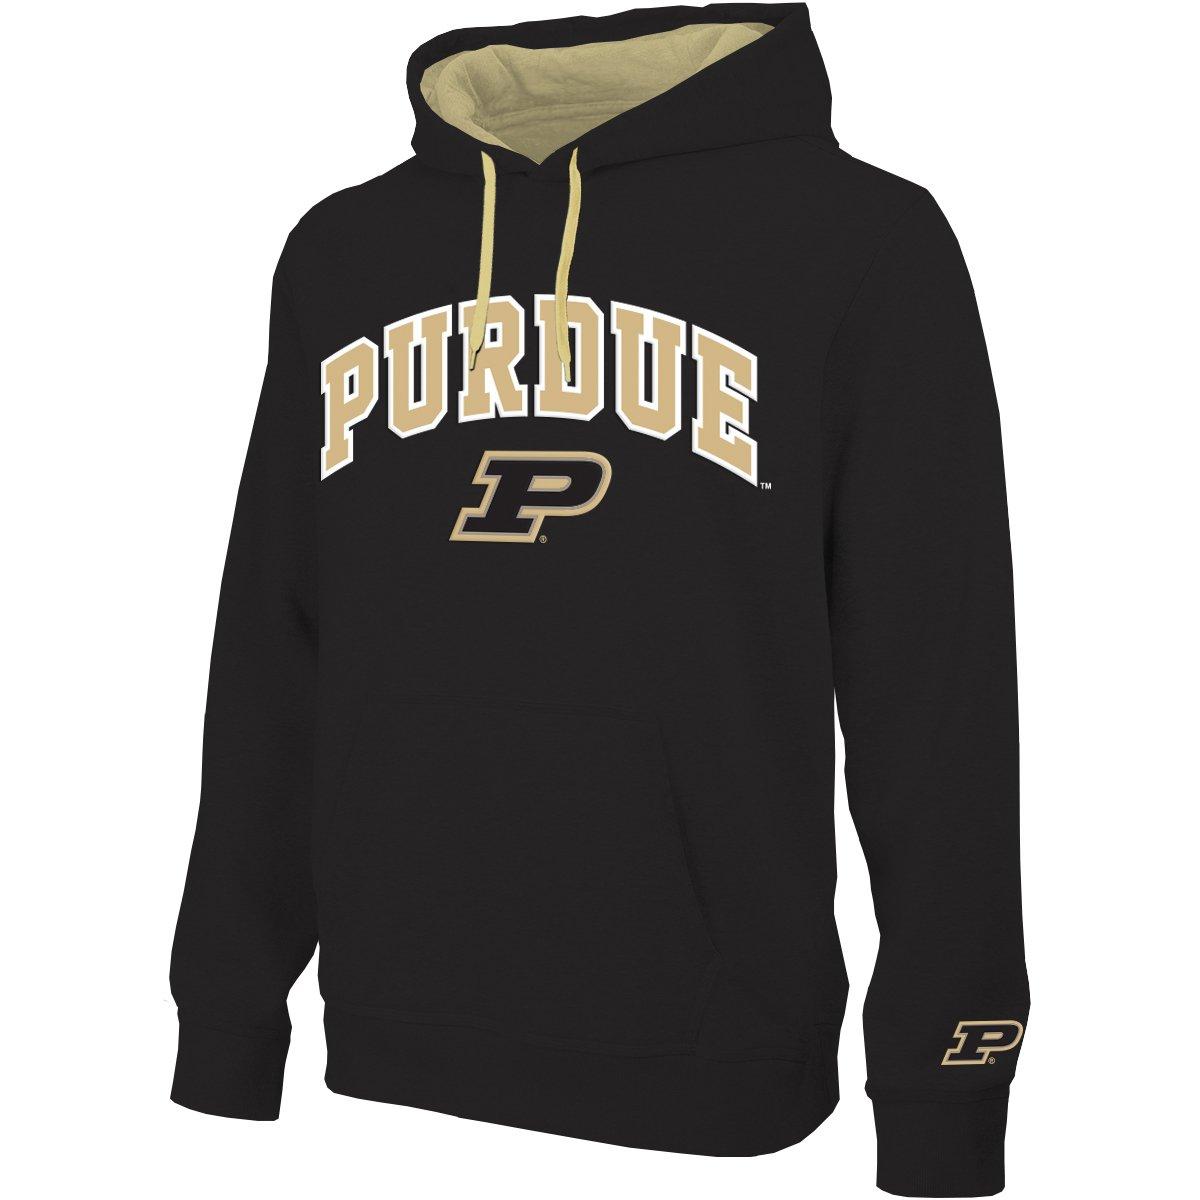 E5 Men's NCAA Hoodie, Purdue, L by E5